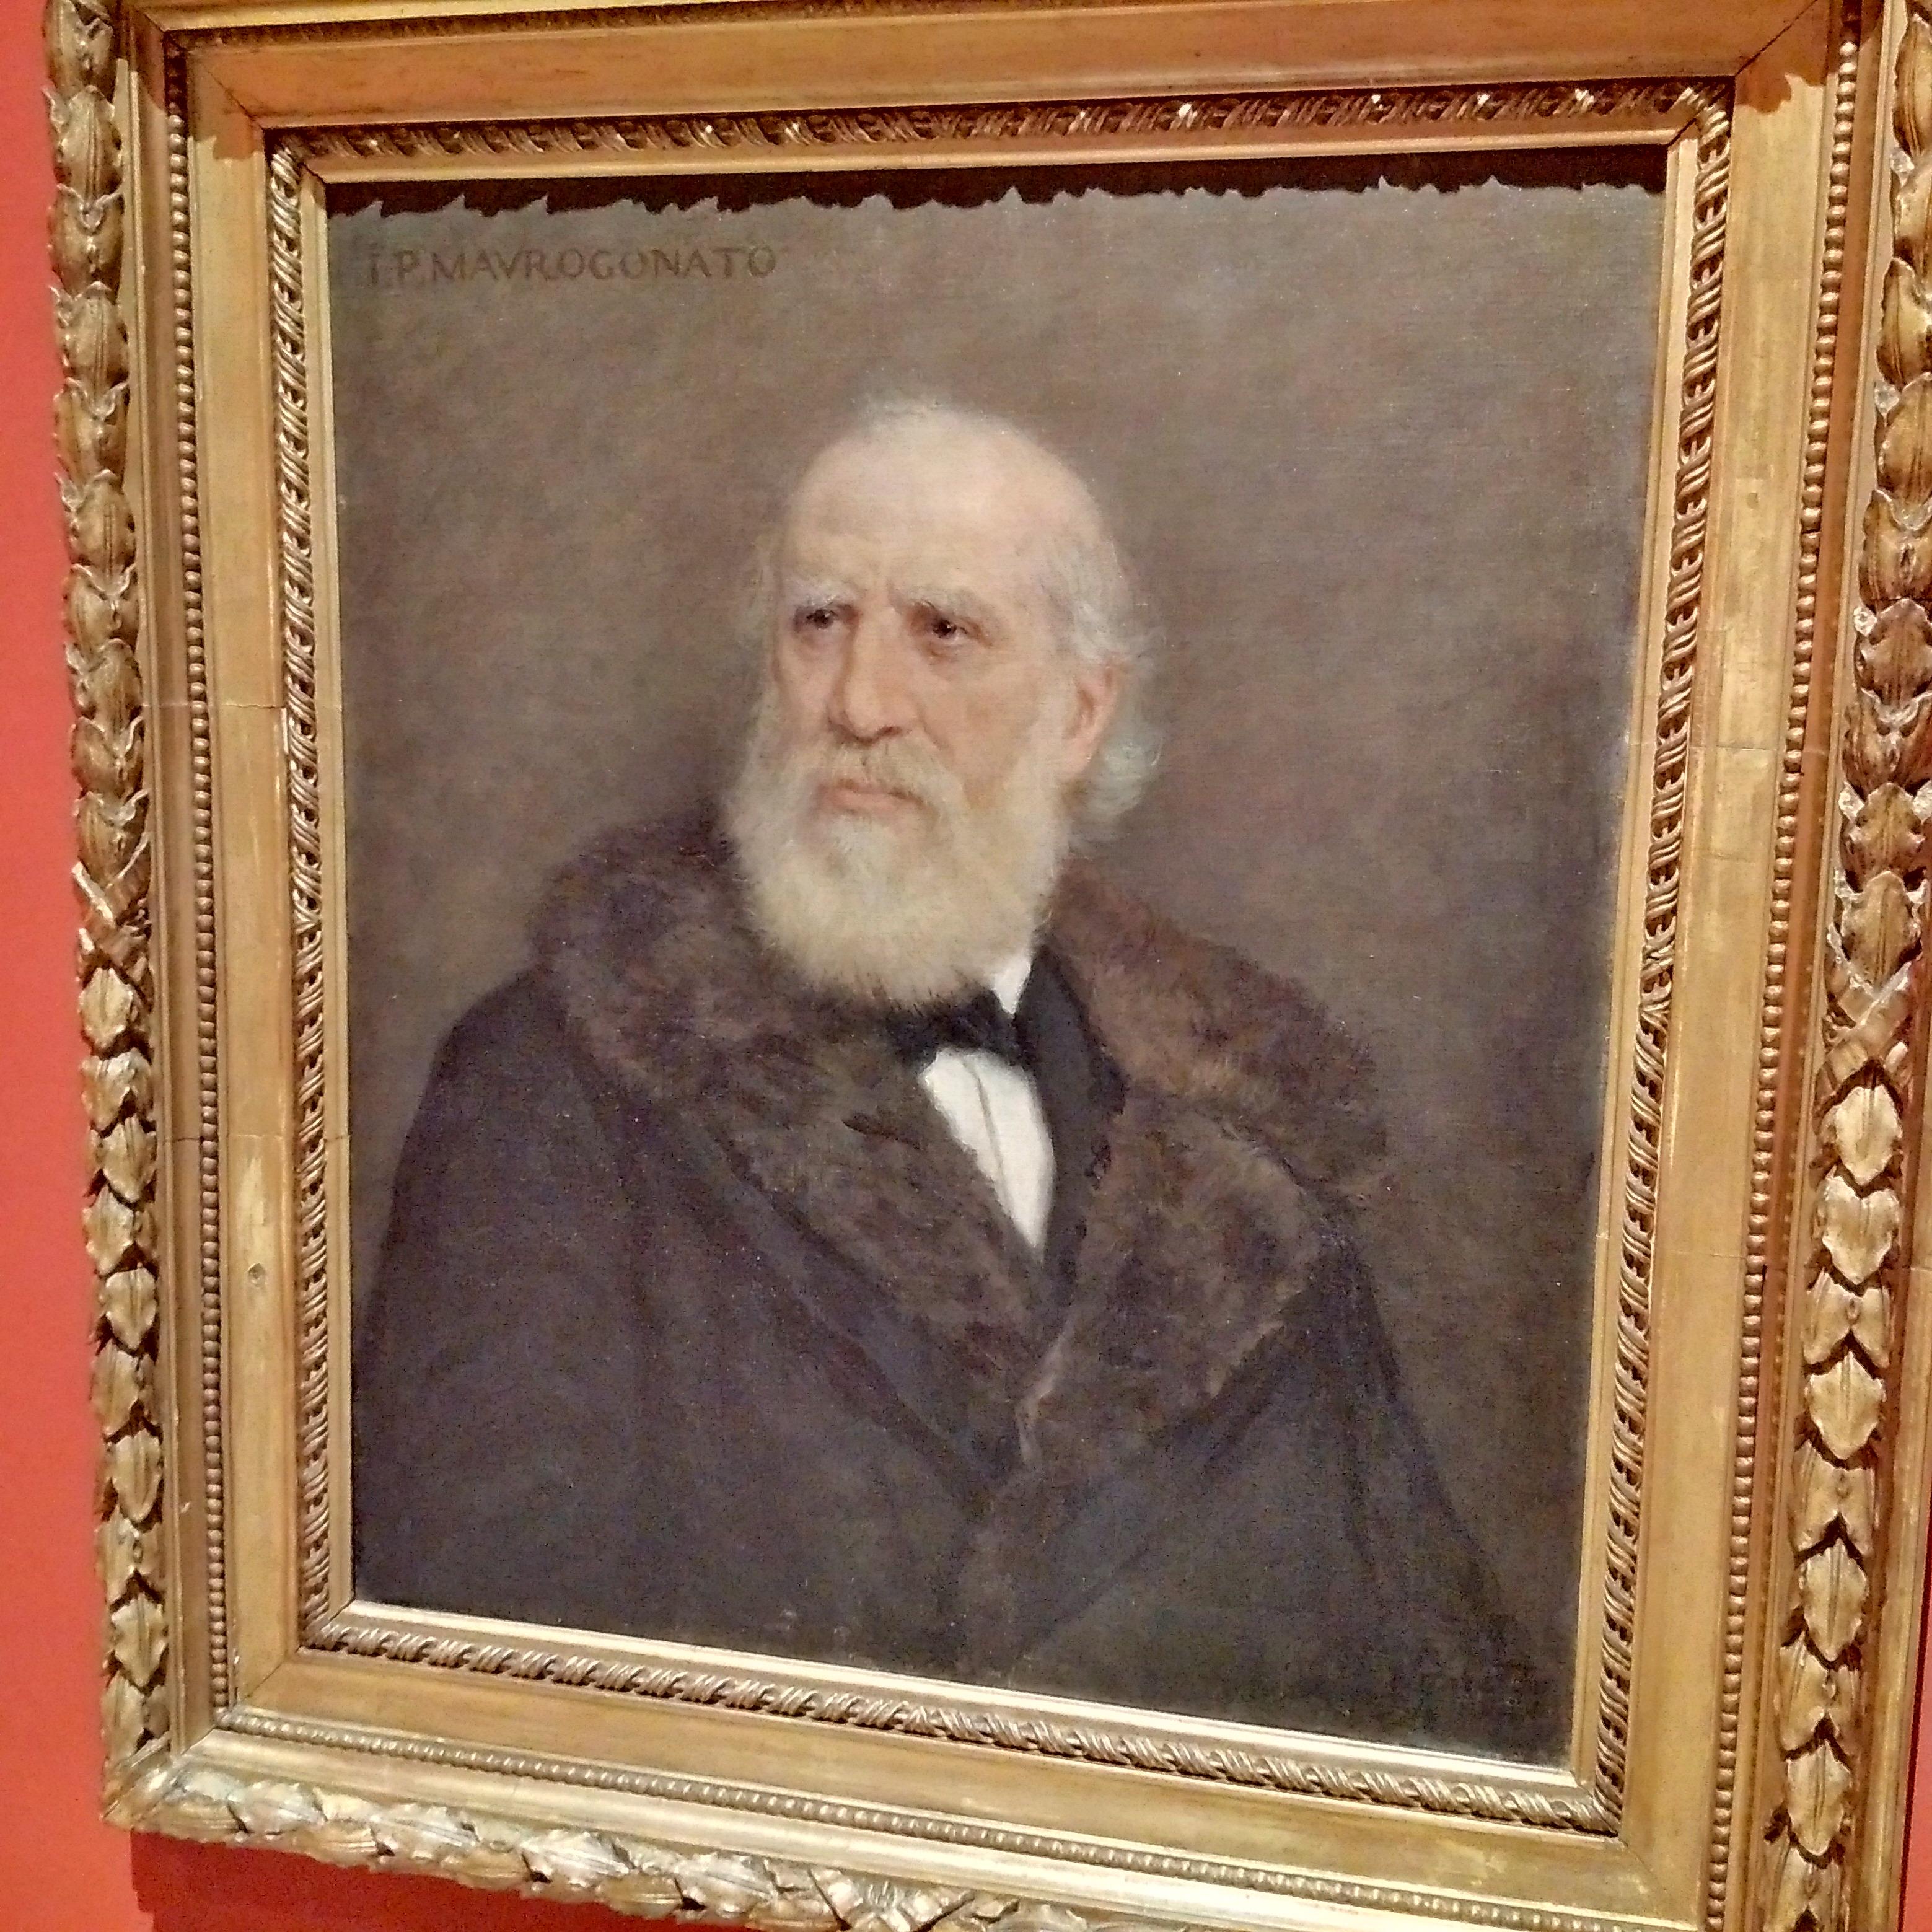 Jacopo Pesaro Maurogonato - Minister of Finance during the revolutionary gov.t 1848 - 1849